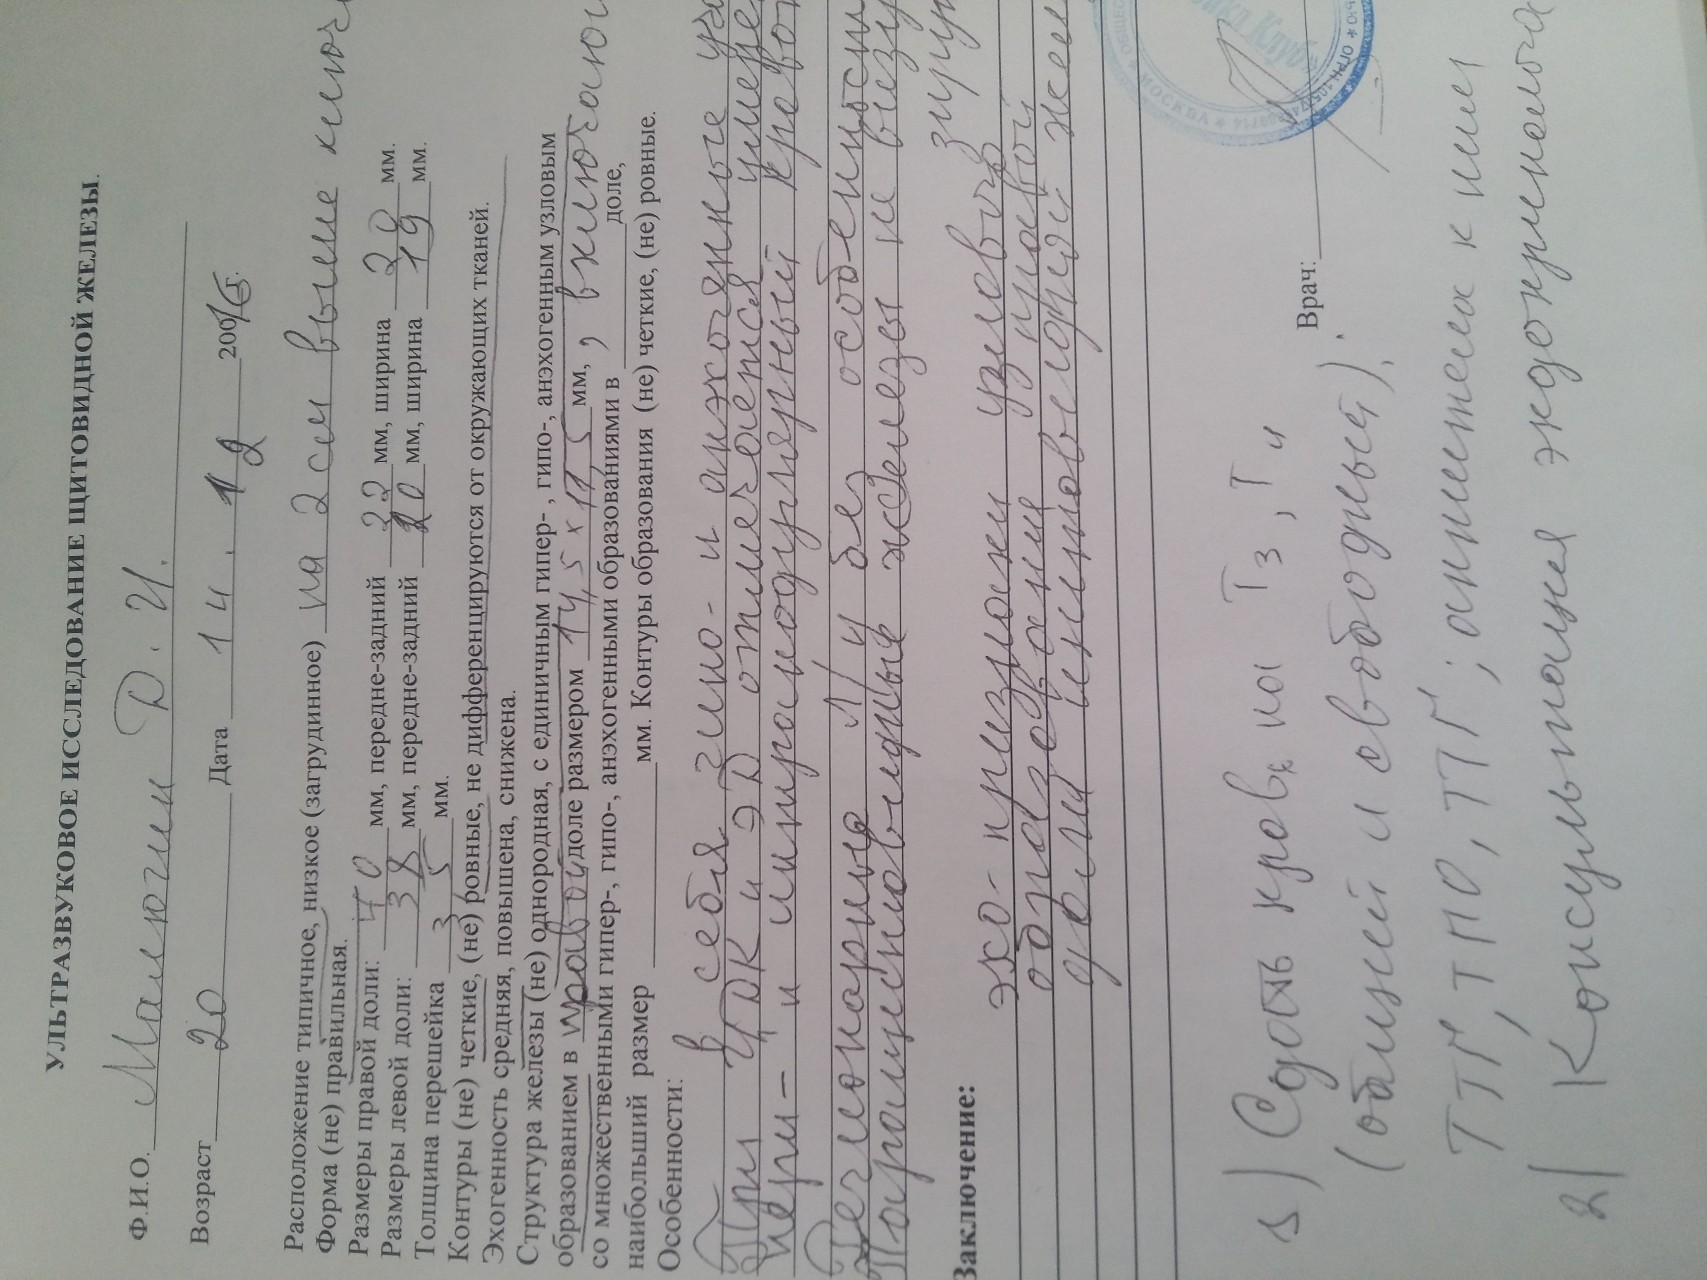 Узел щитовидной железы - Вопрос эндокринологу - 03 Онлайн: http://03online.com/news/uzel_shchitovidnoy_zhelezy/2017-1-22-244158